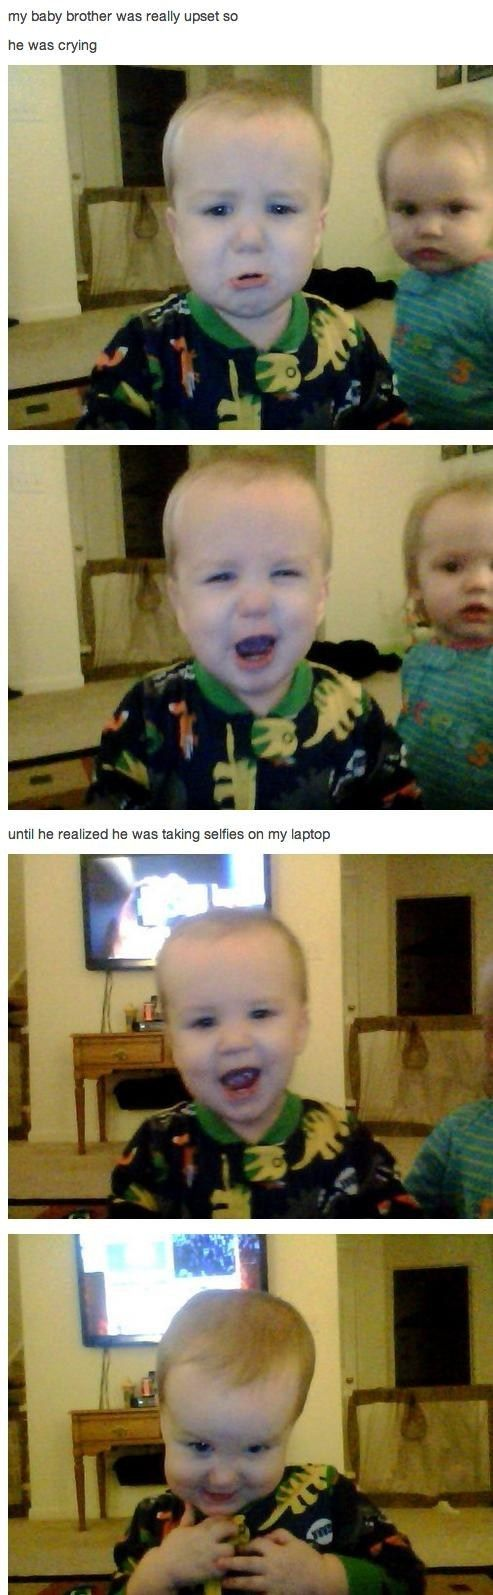 hahahaha this just made my day!